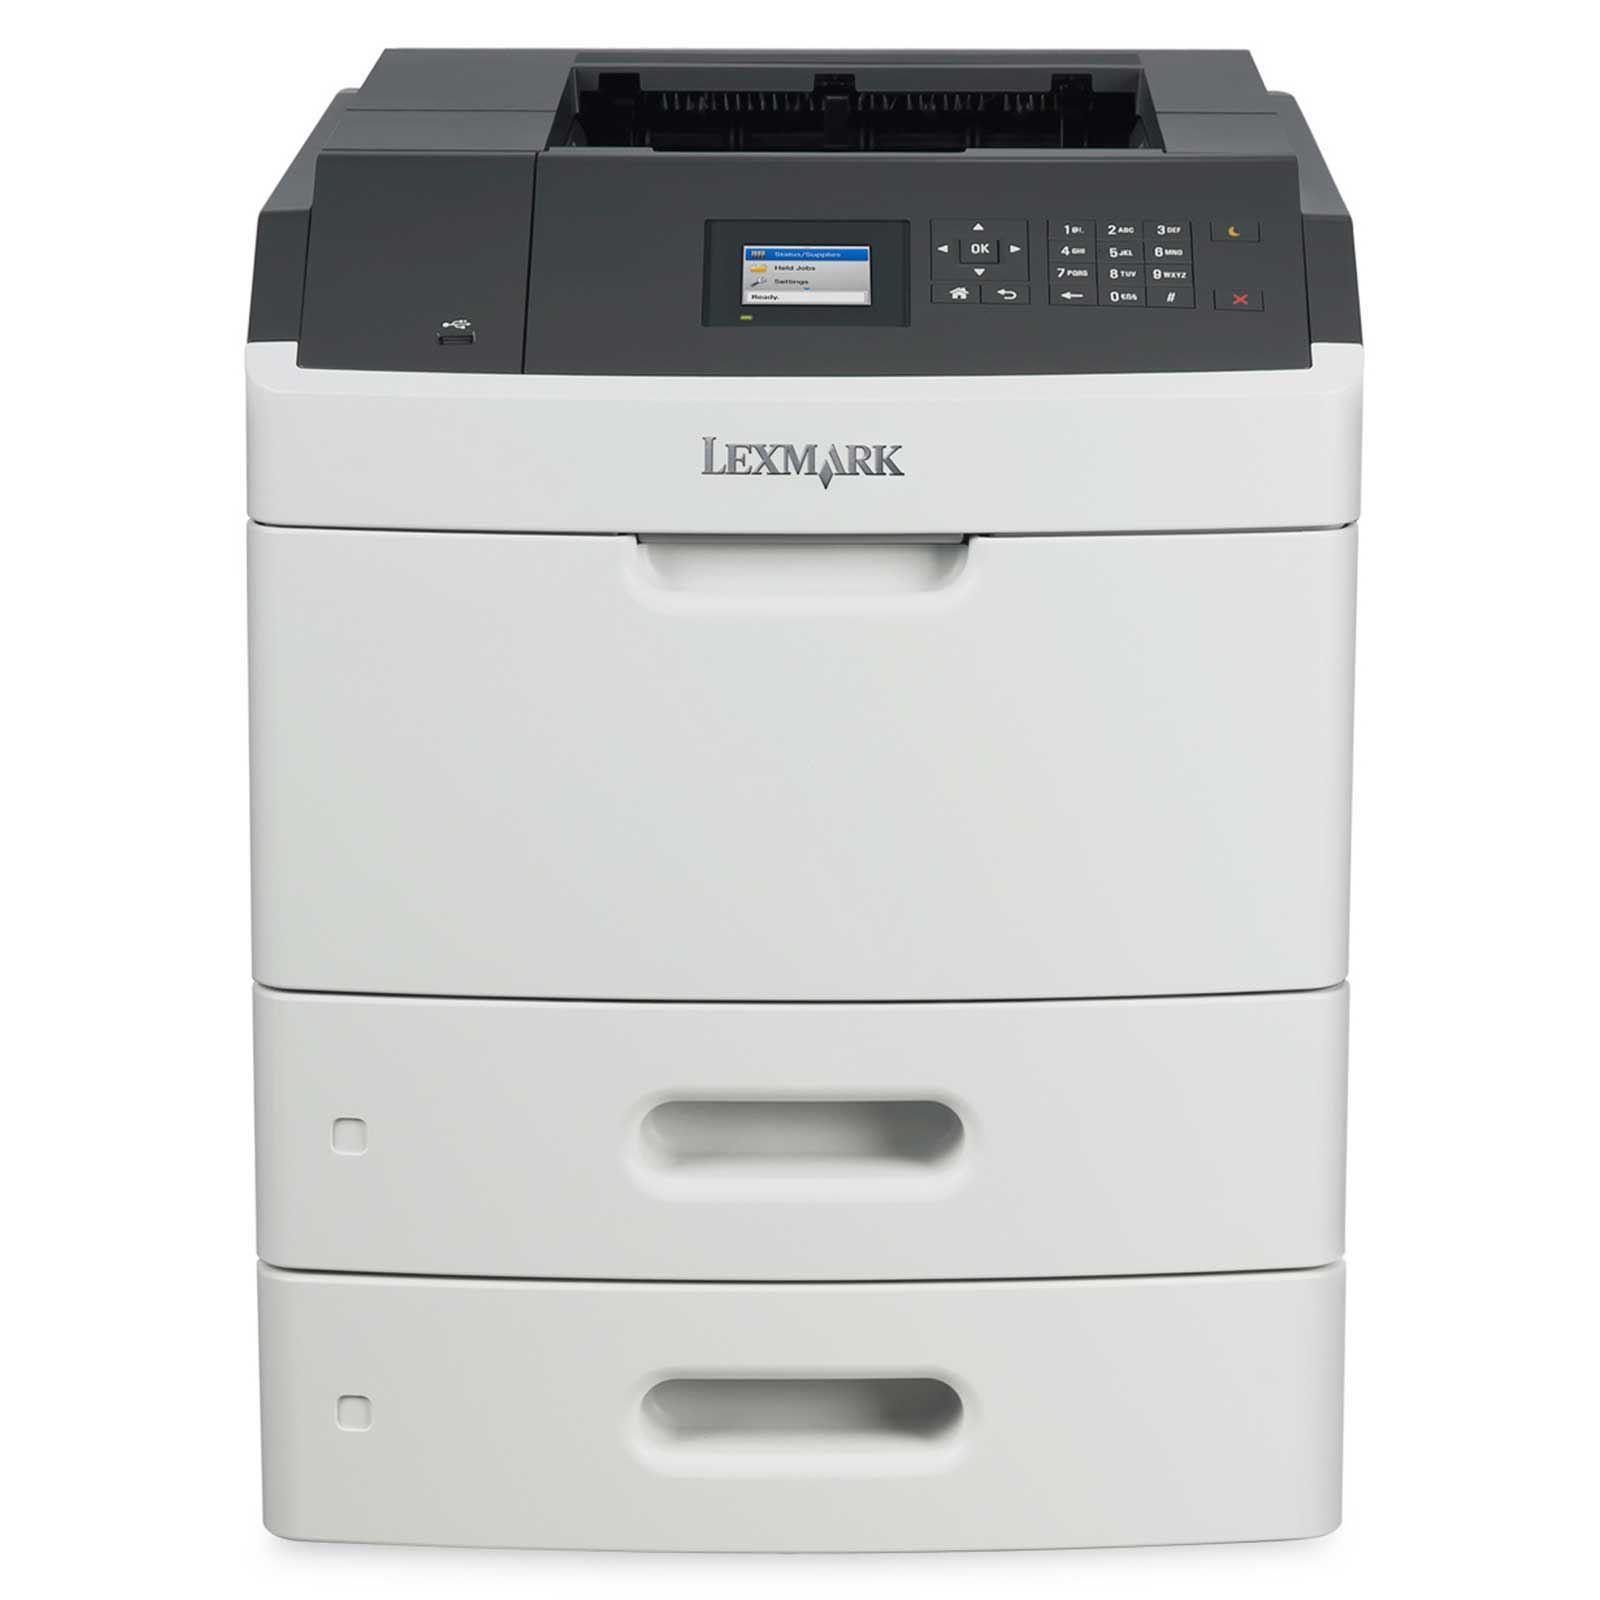 Lexmark MS812dtn,A4,1200x1200dpi,66ppm,duplex,LAN